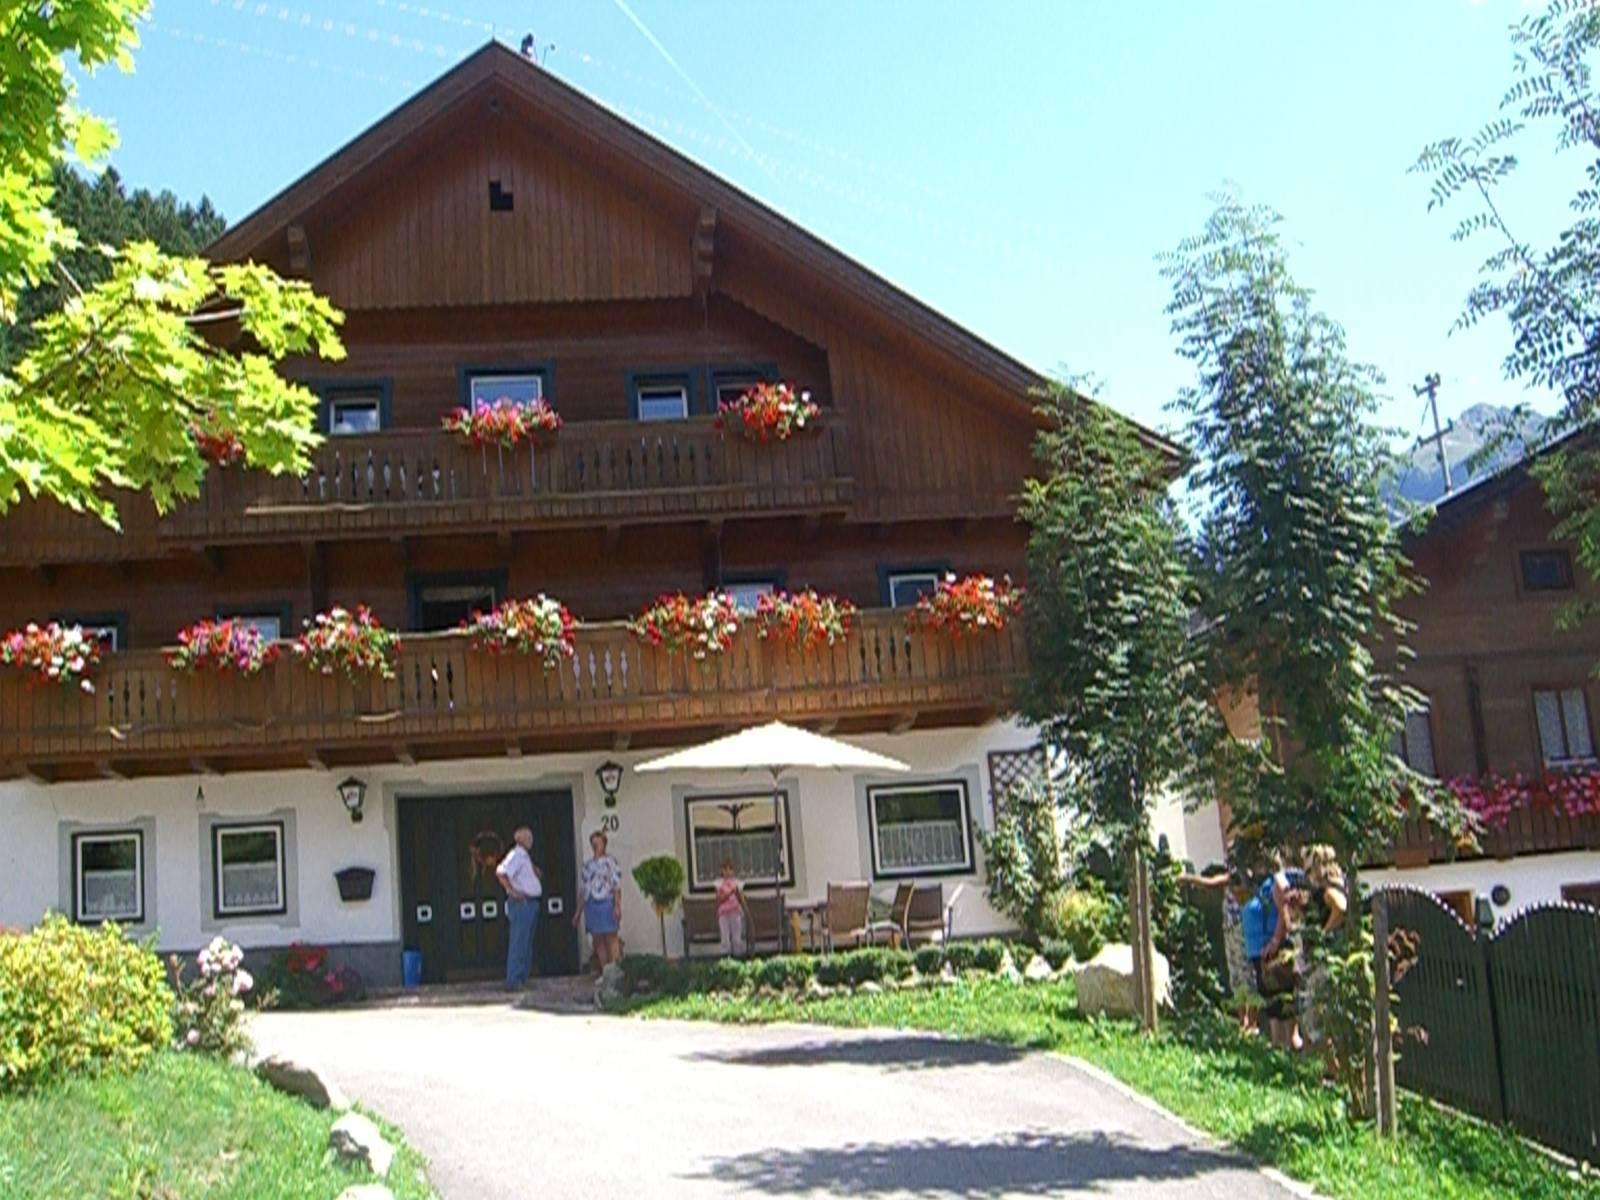 Gasthof Dorfschenke Stall Revngo Com